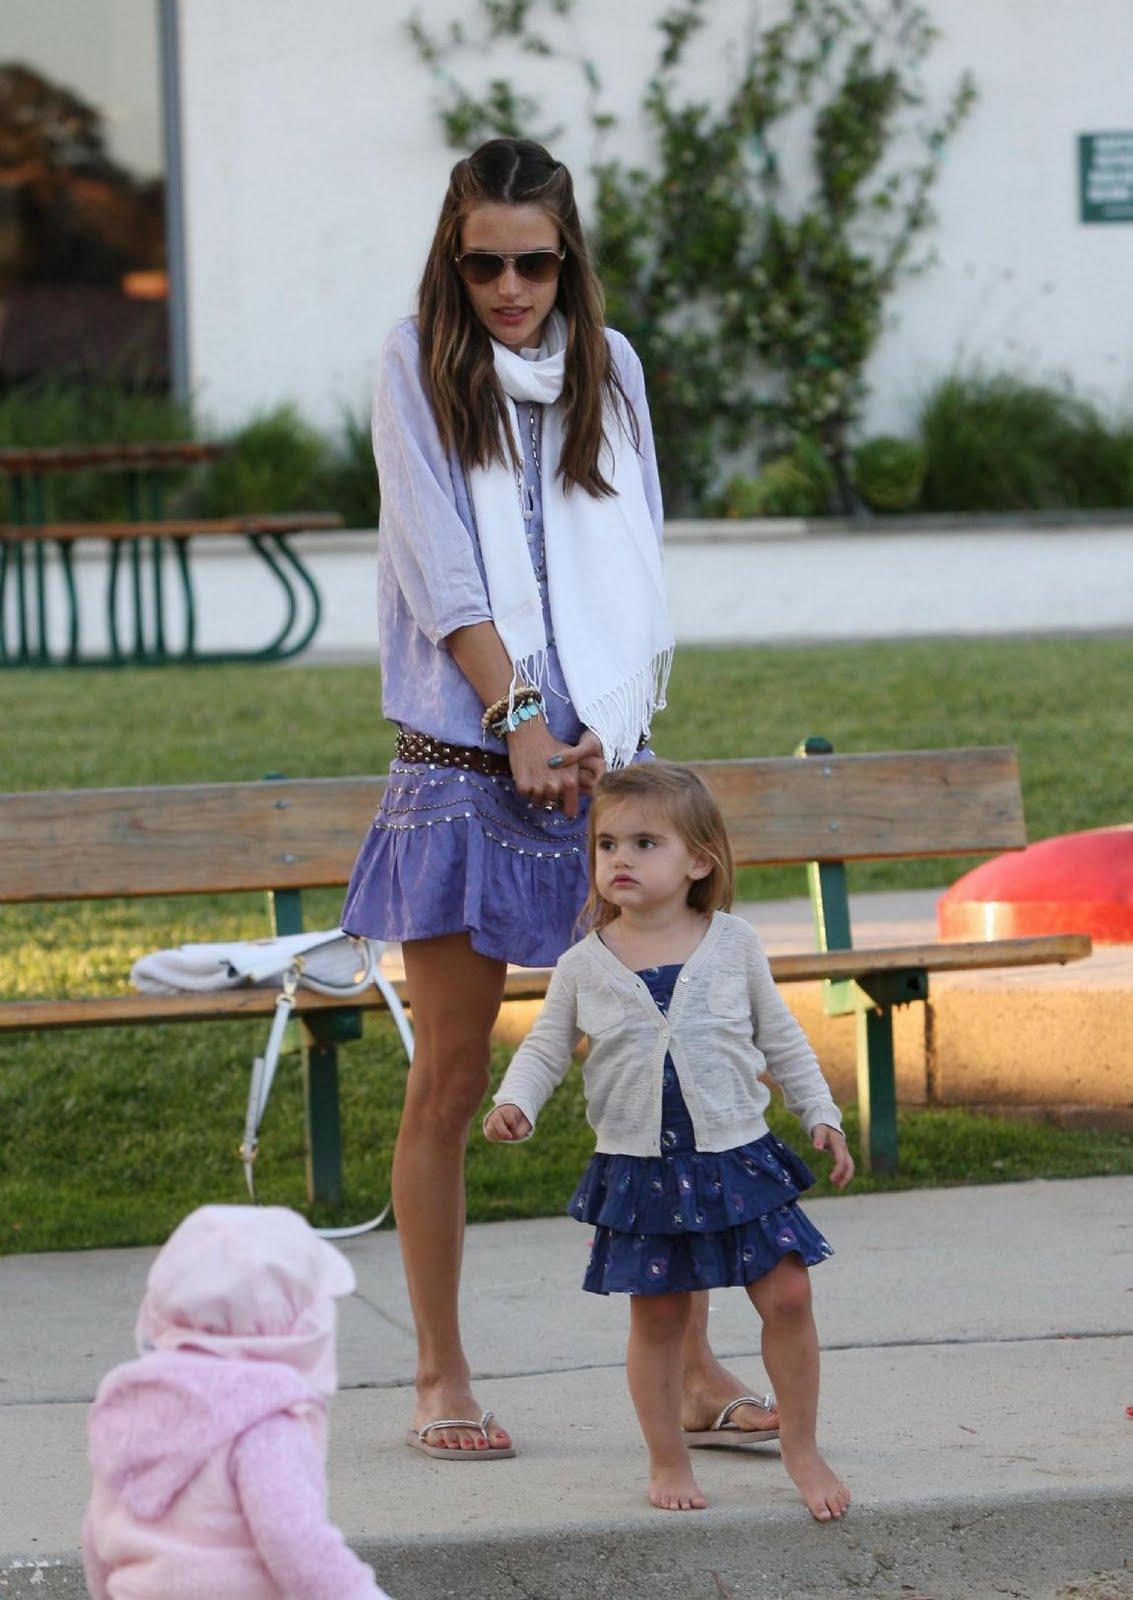 http://2.bp.blogspot.com/-PMED7CGfIH4/TeaX7RtvIfI/AAAAAAAAKgc/yNze27RkaCw/s1600/Alessandra+Ambrosio+with+her+daughter+at+a+park+in+Malibu+%25281%2529.jpg